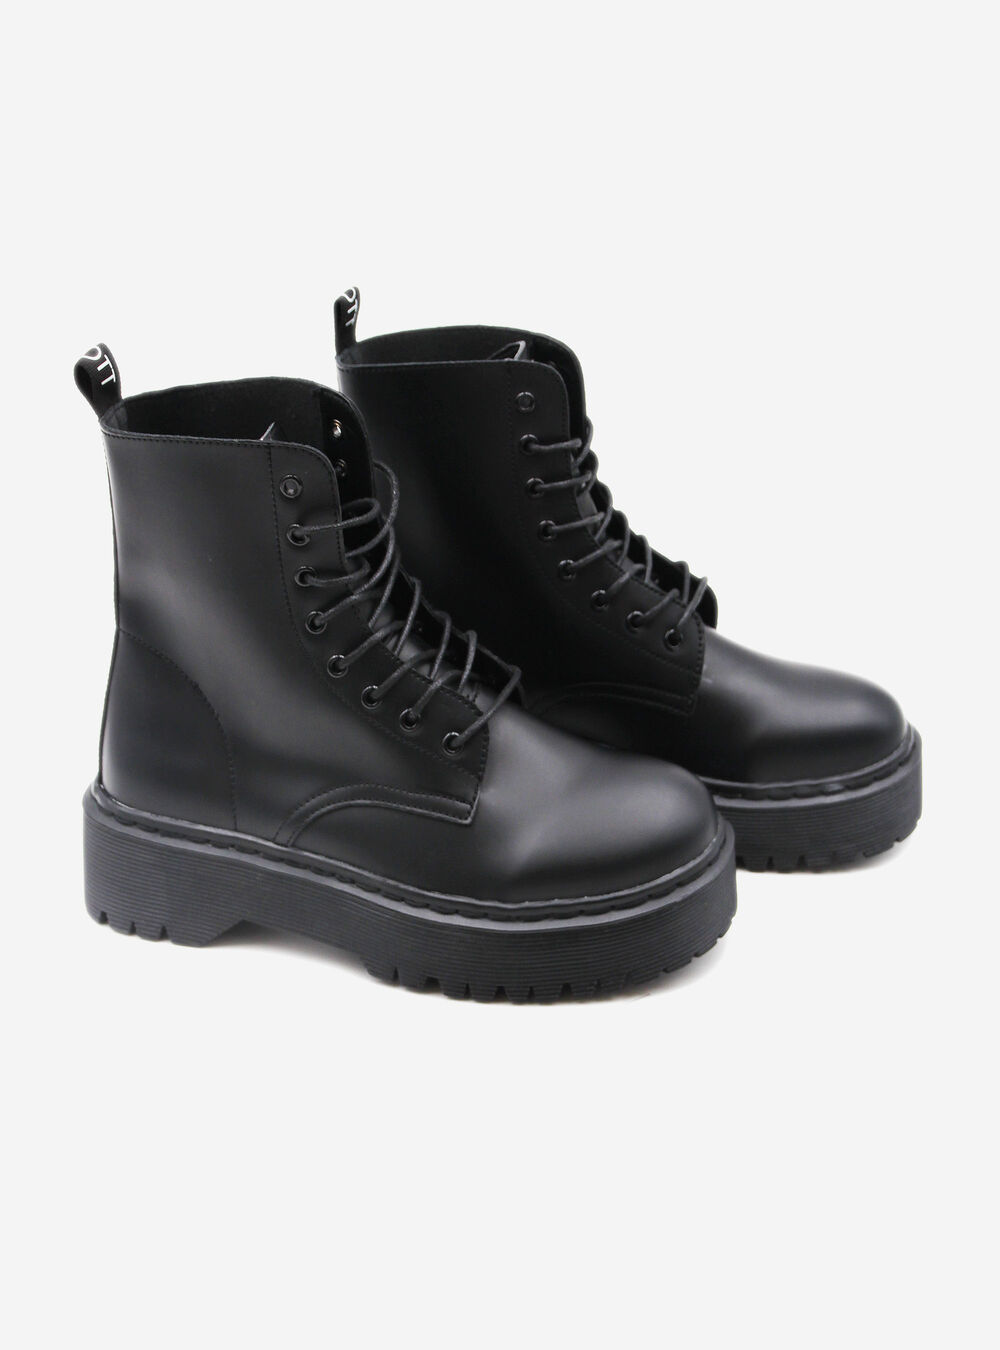 buy popular a15c2 92a8a Scarpe Donna: sandali e sneakers   Acquista online su Alcott